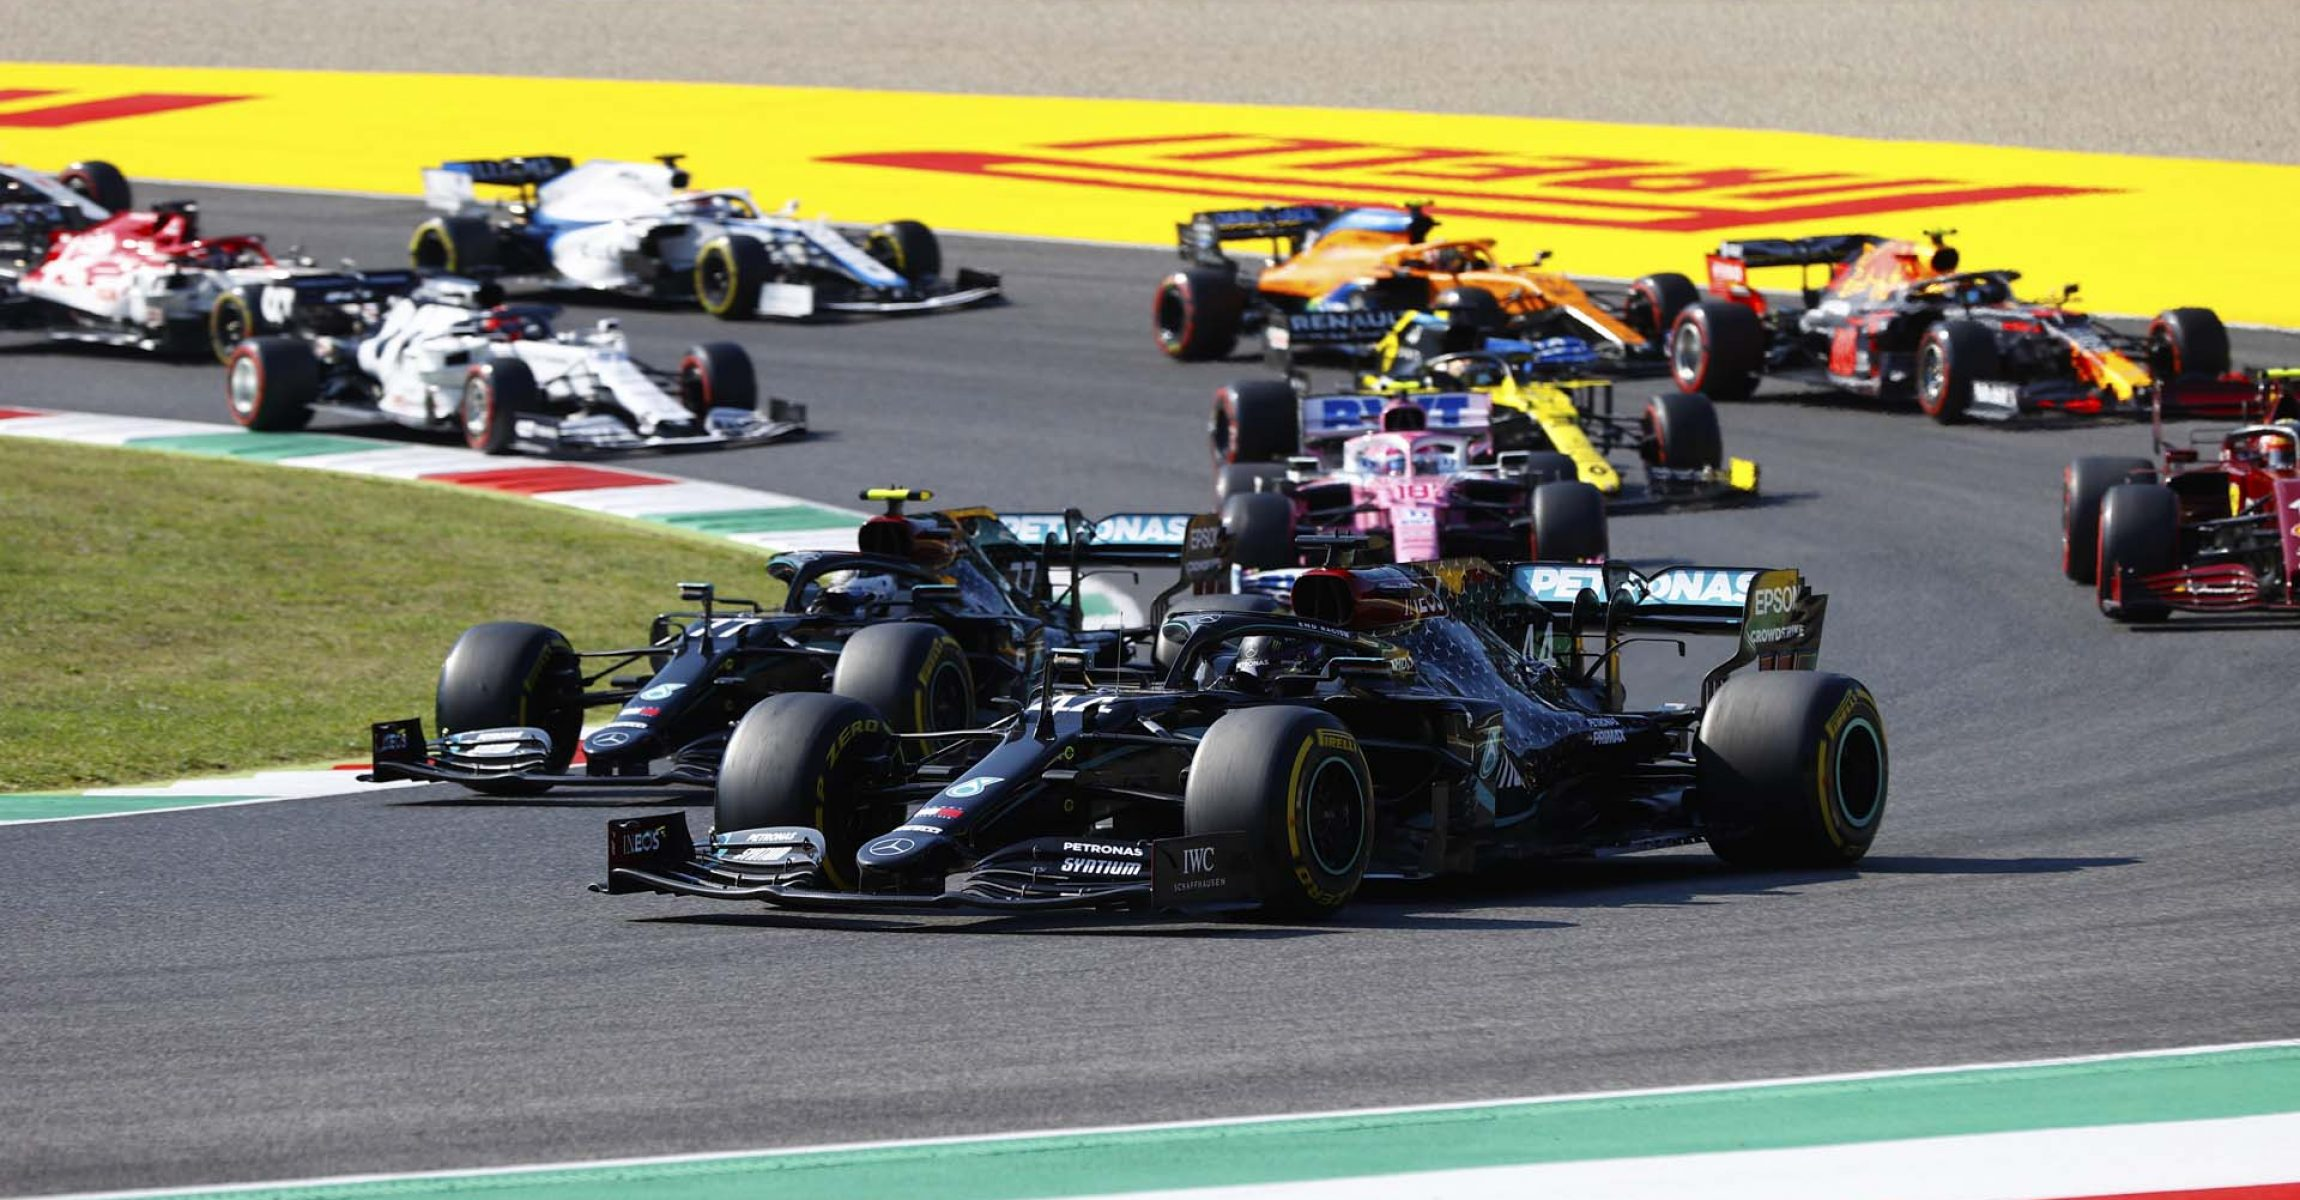 2020 Tuscan Grand Prix, Sunday - LAT Images start Mercedes